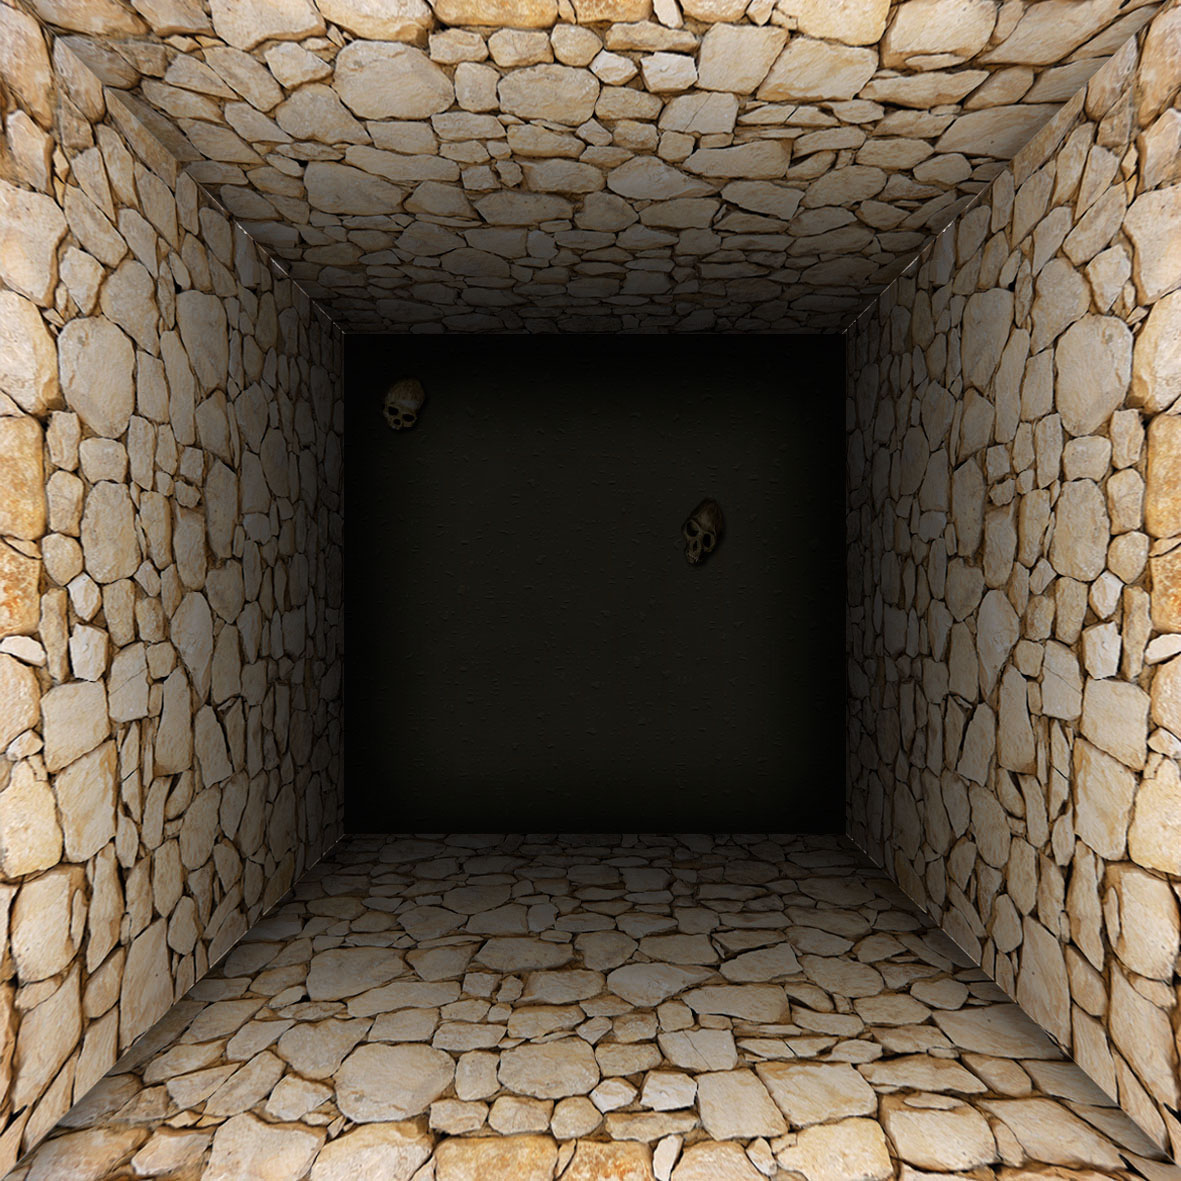 infinite builds create pit michael iantorno